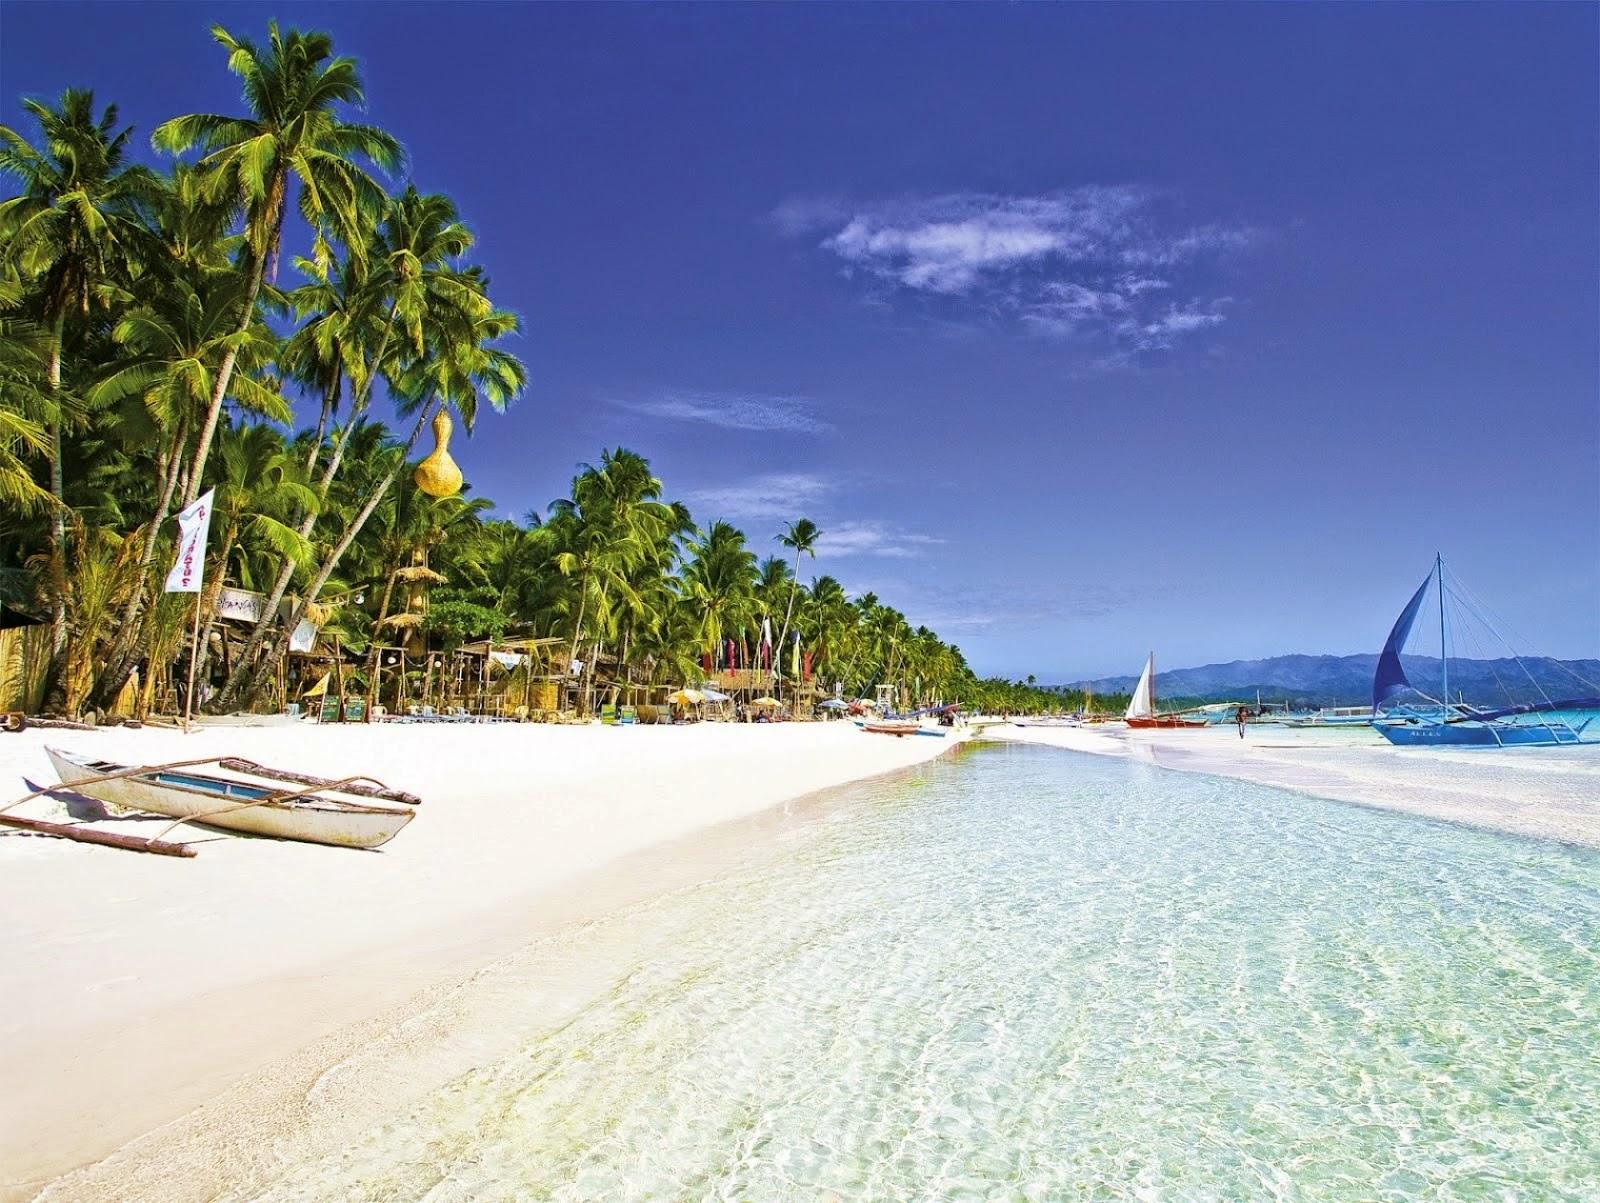 Boracay Island Philippines - Images - XciteFun.net